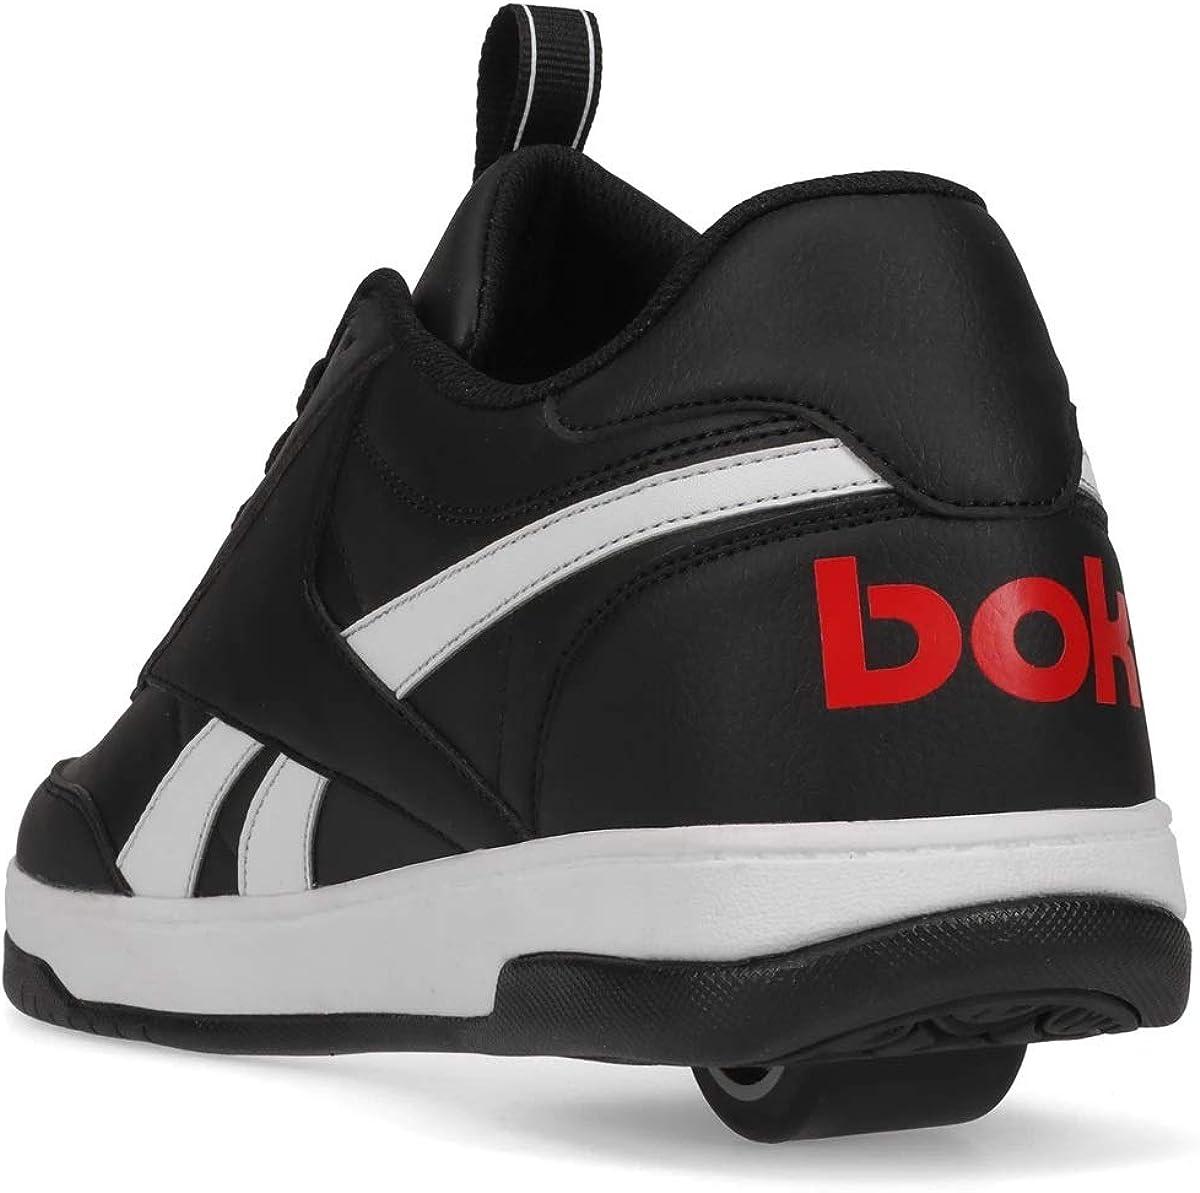 Heelys Mens CL Court Low Wheels Skate Sneaker Shoes